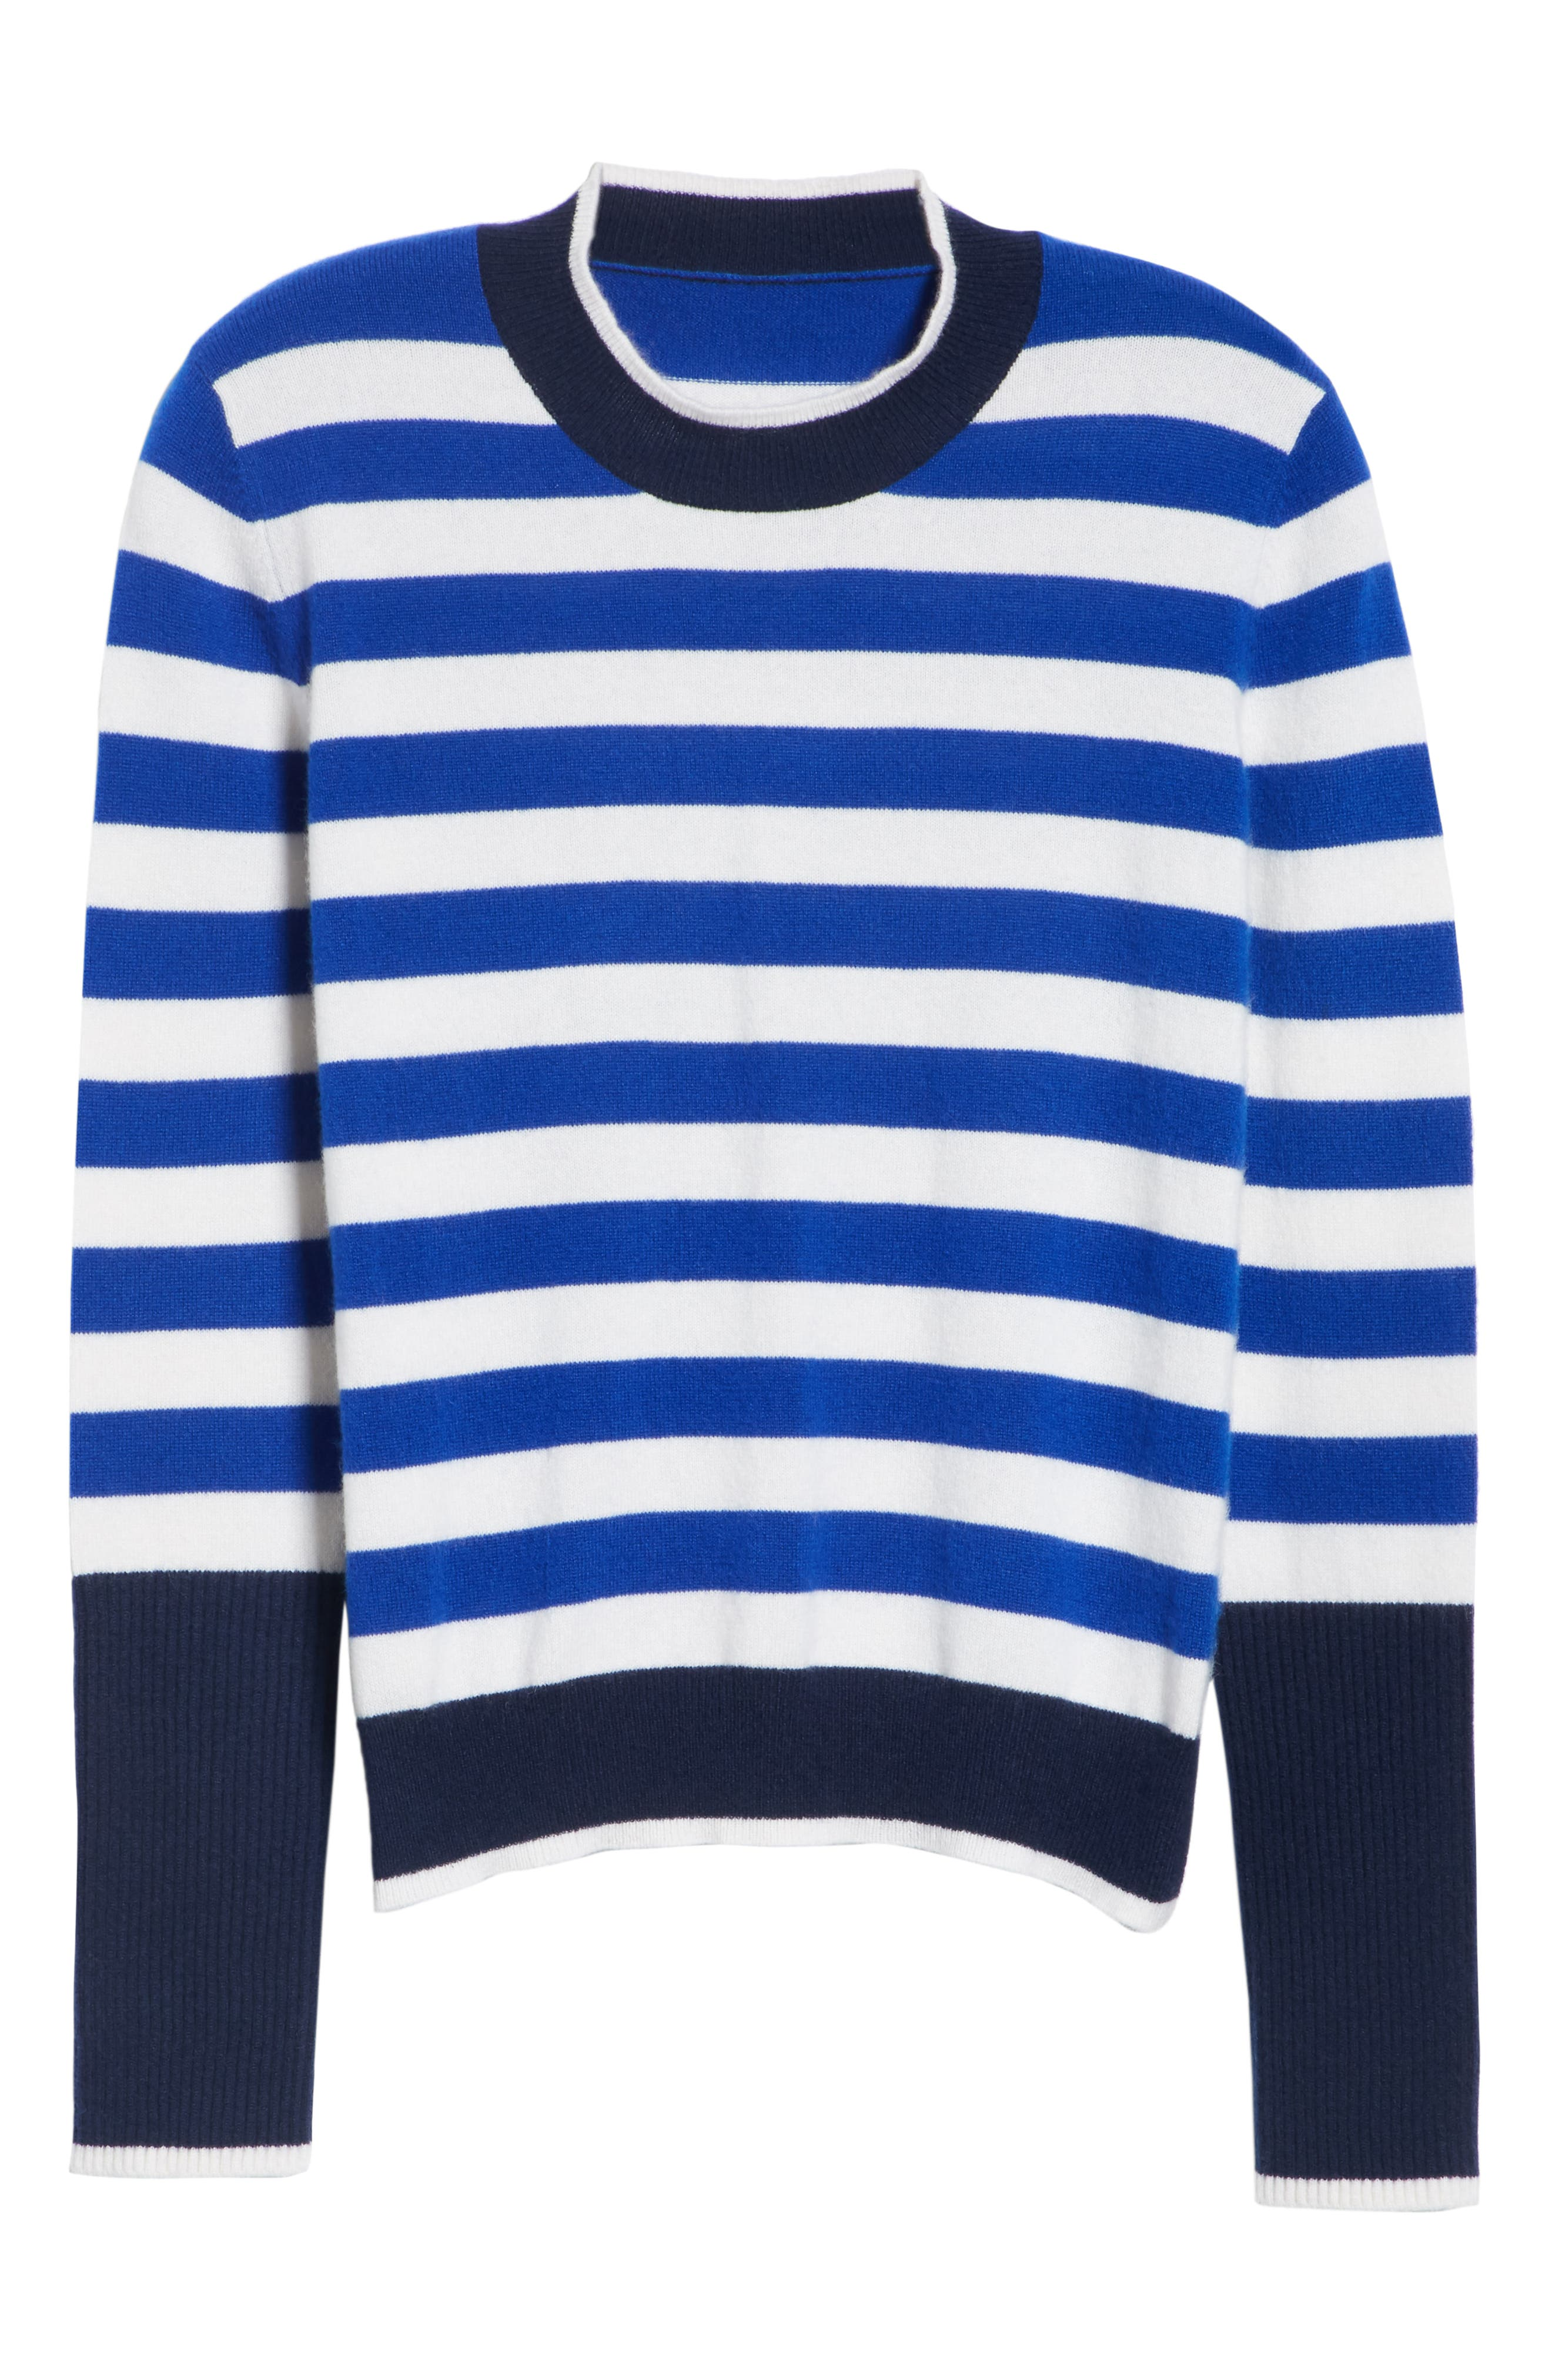 L'Universite Cashmere Sweater,                             Alternate thumbnail 6, color,                             BRIGHT BLUE/ CREAM/ NAVY